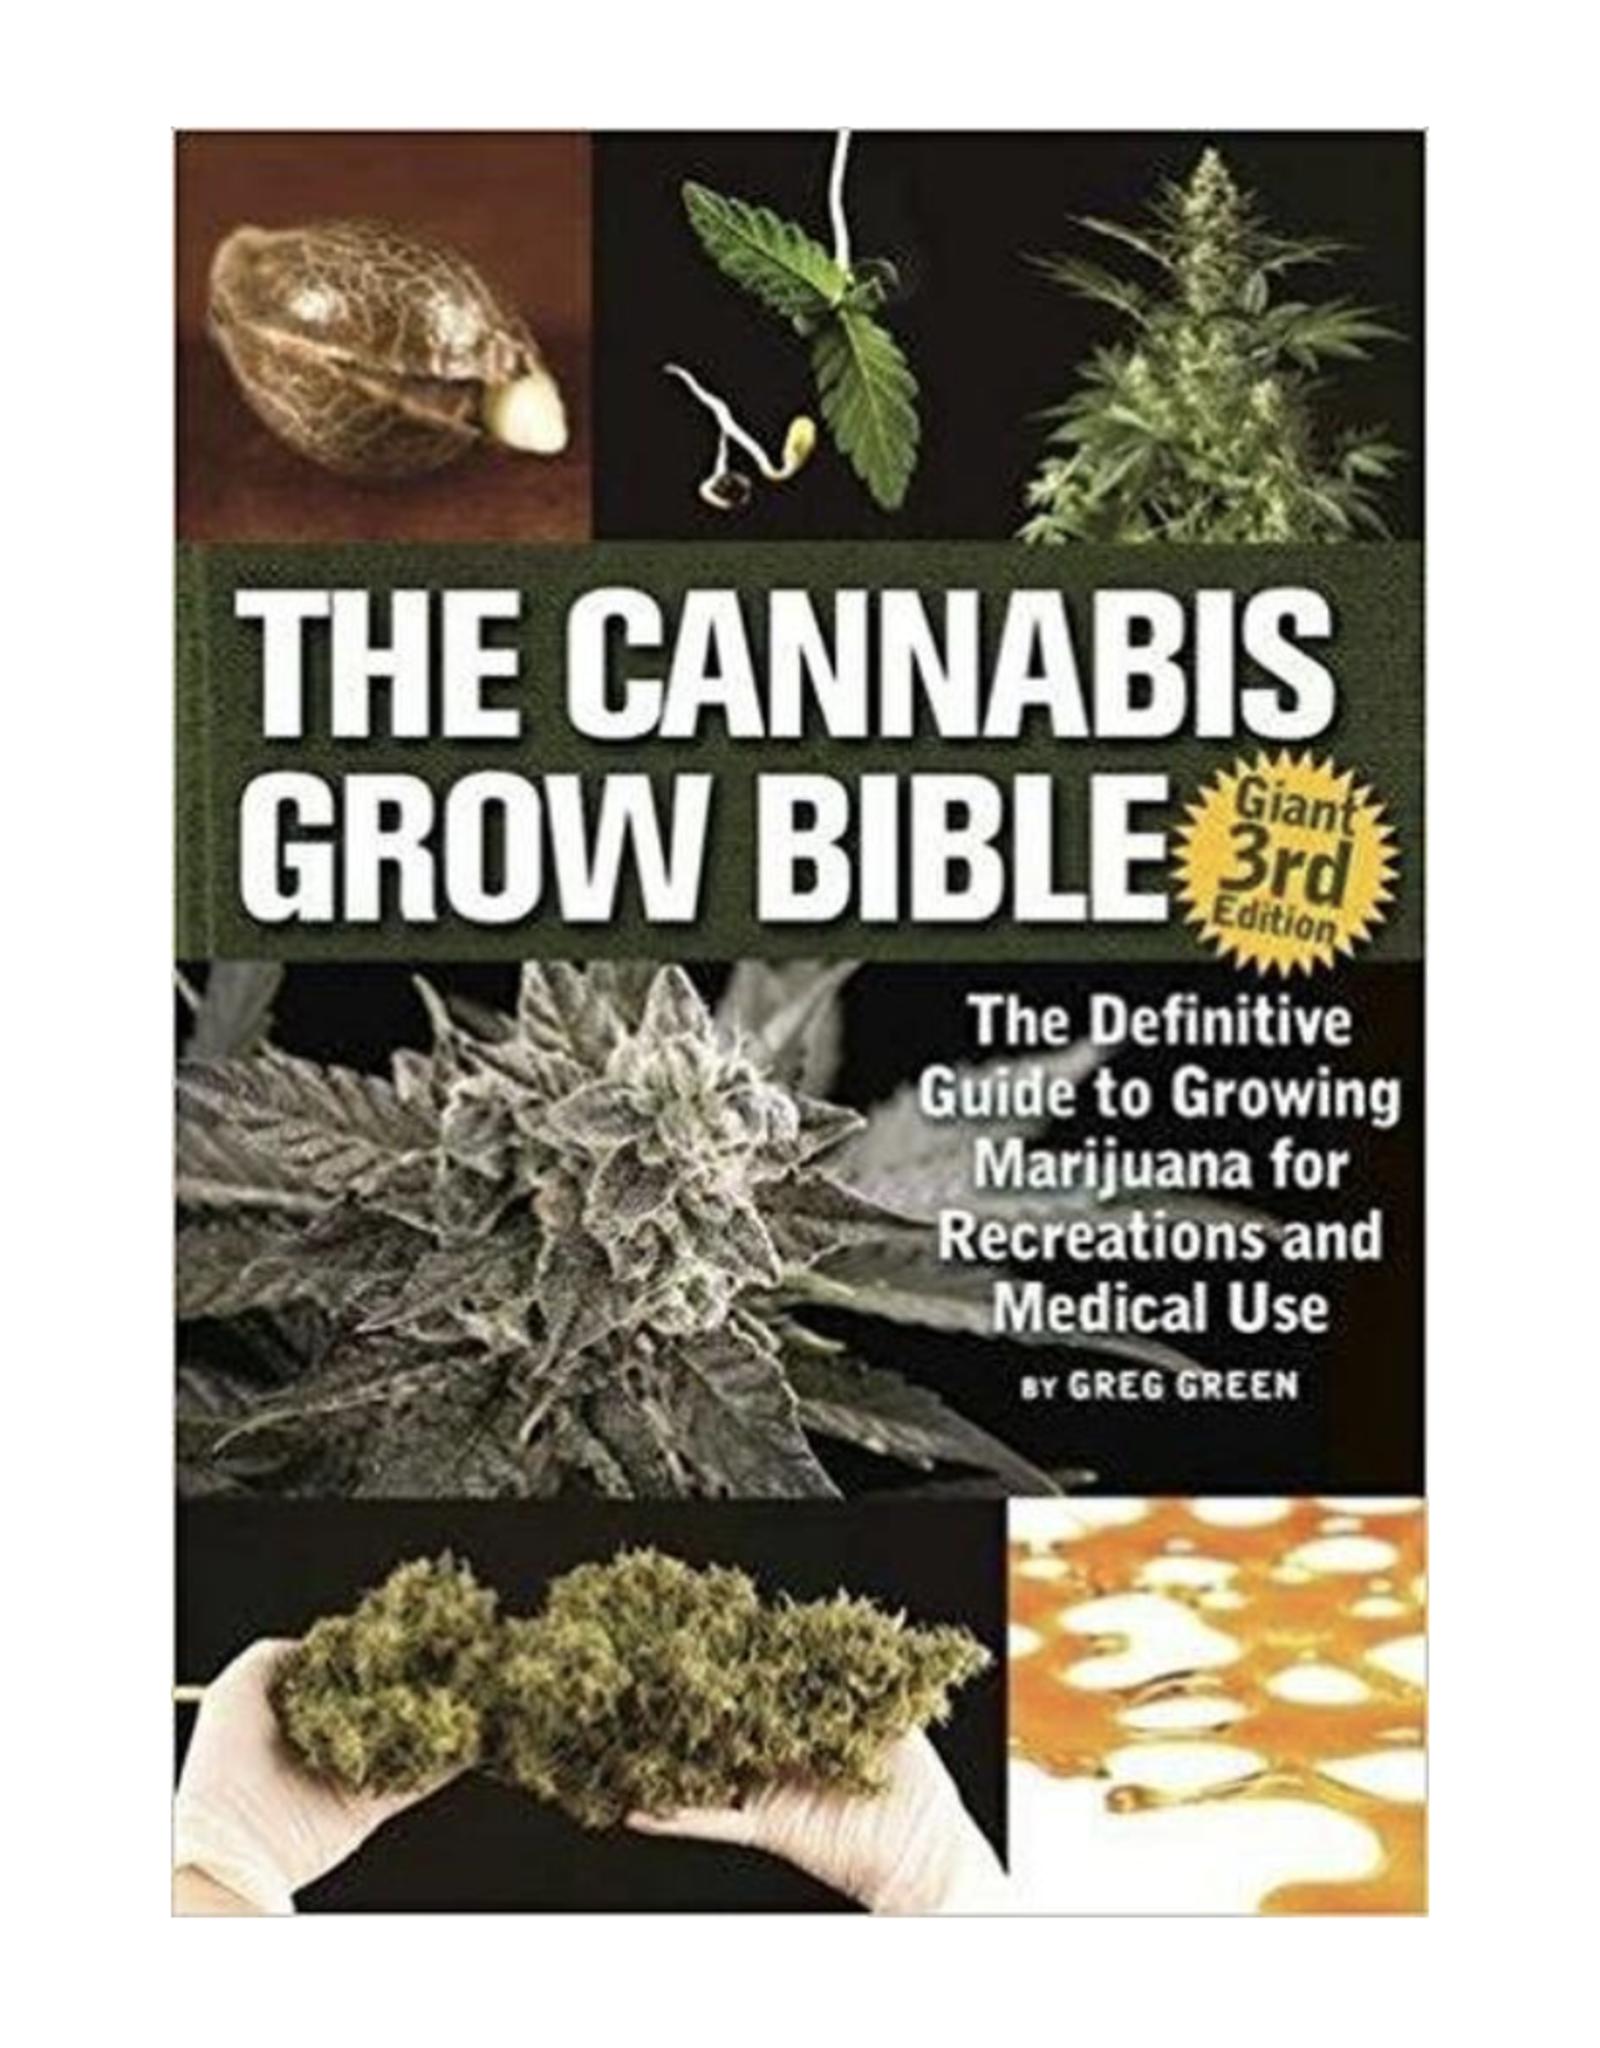 Cannabis Grow Bible Version 3 by Greg Green